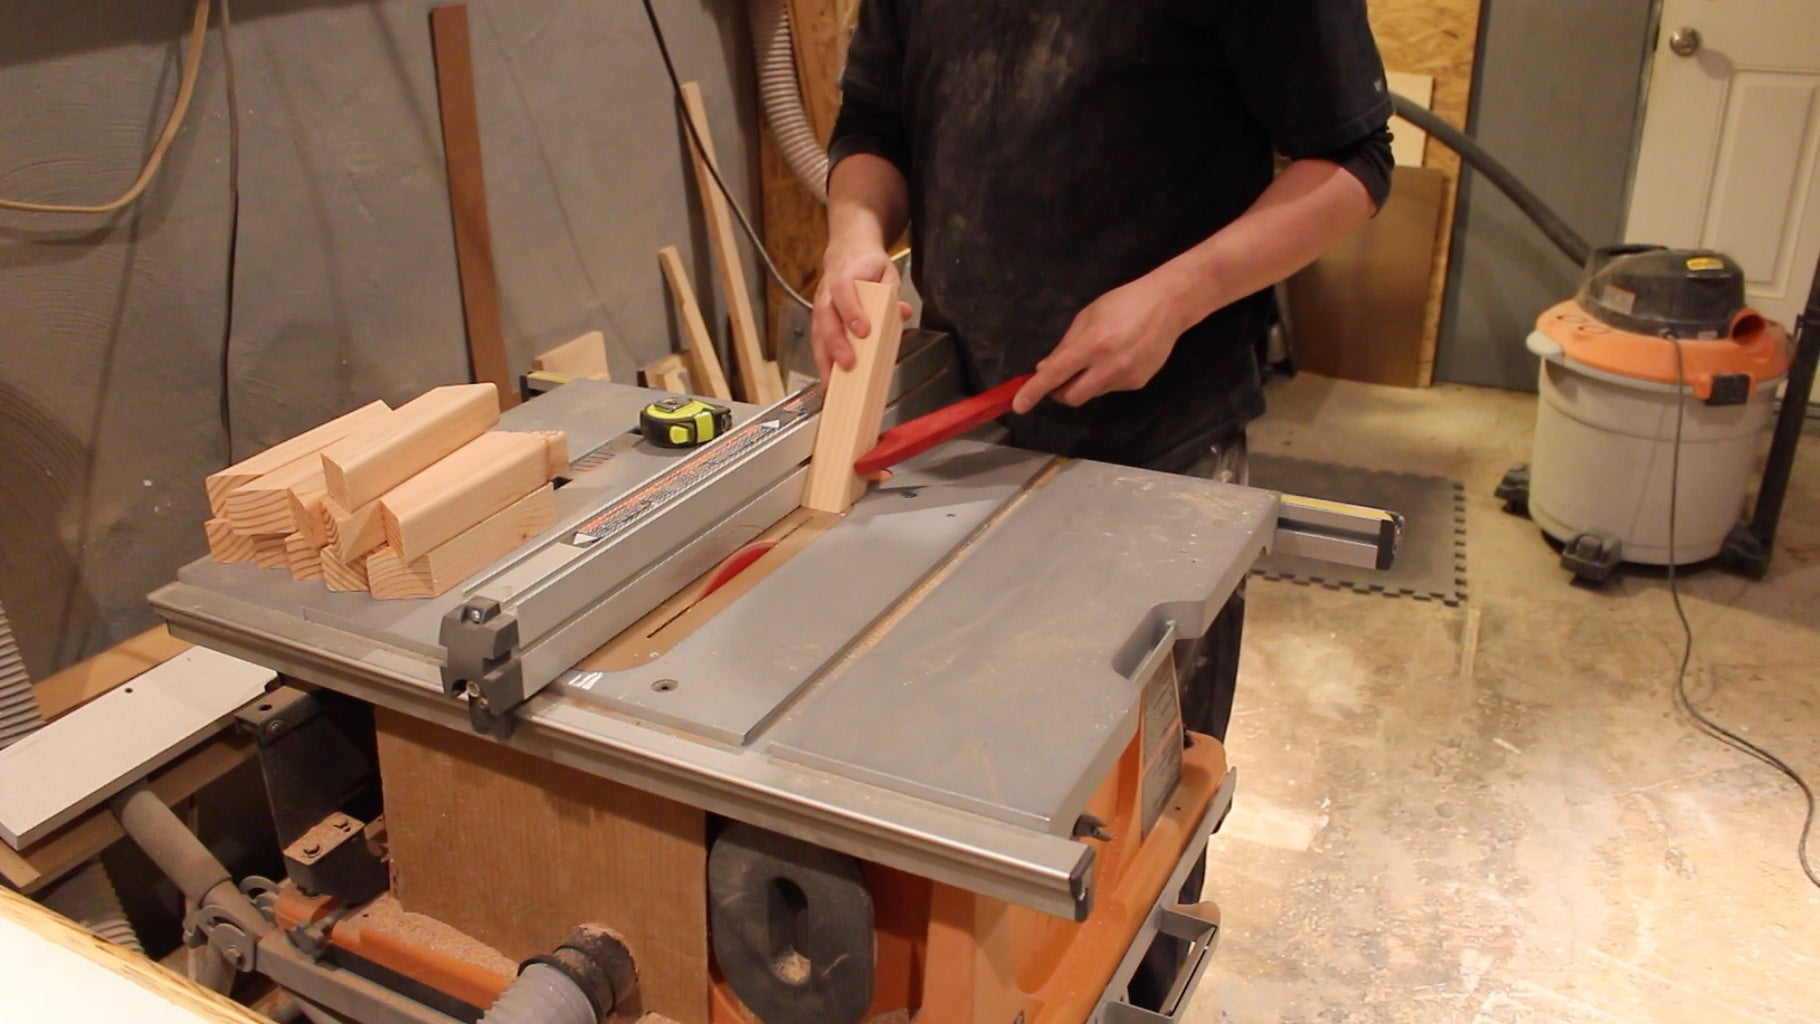 Fabricating the Hoop Segments